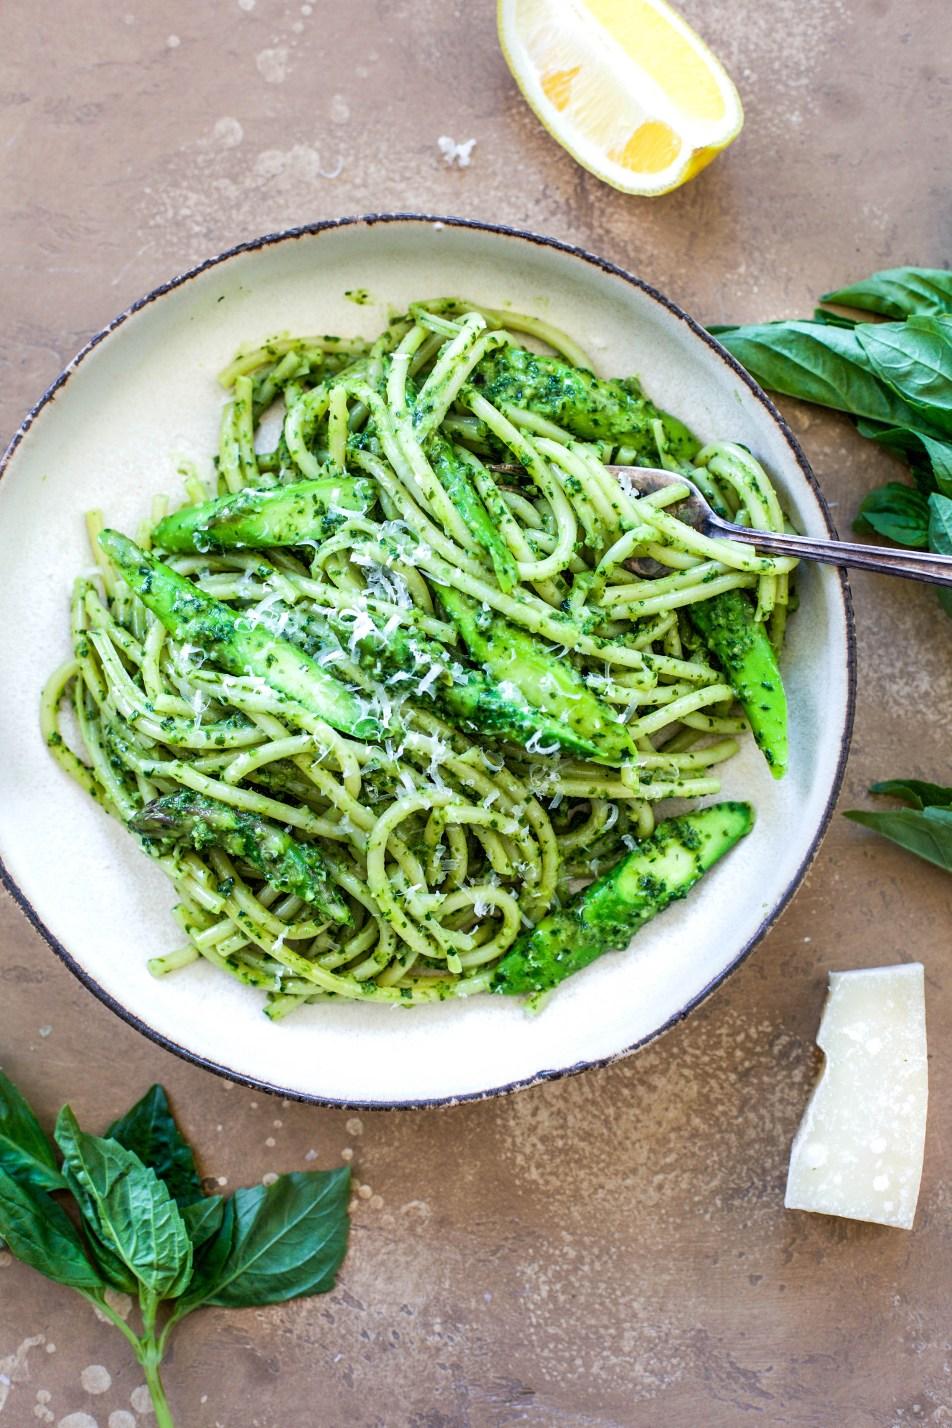 Spinach Pesto Spaghetti with Asparagus